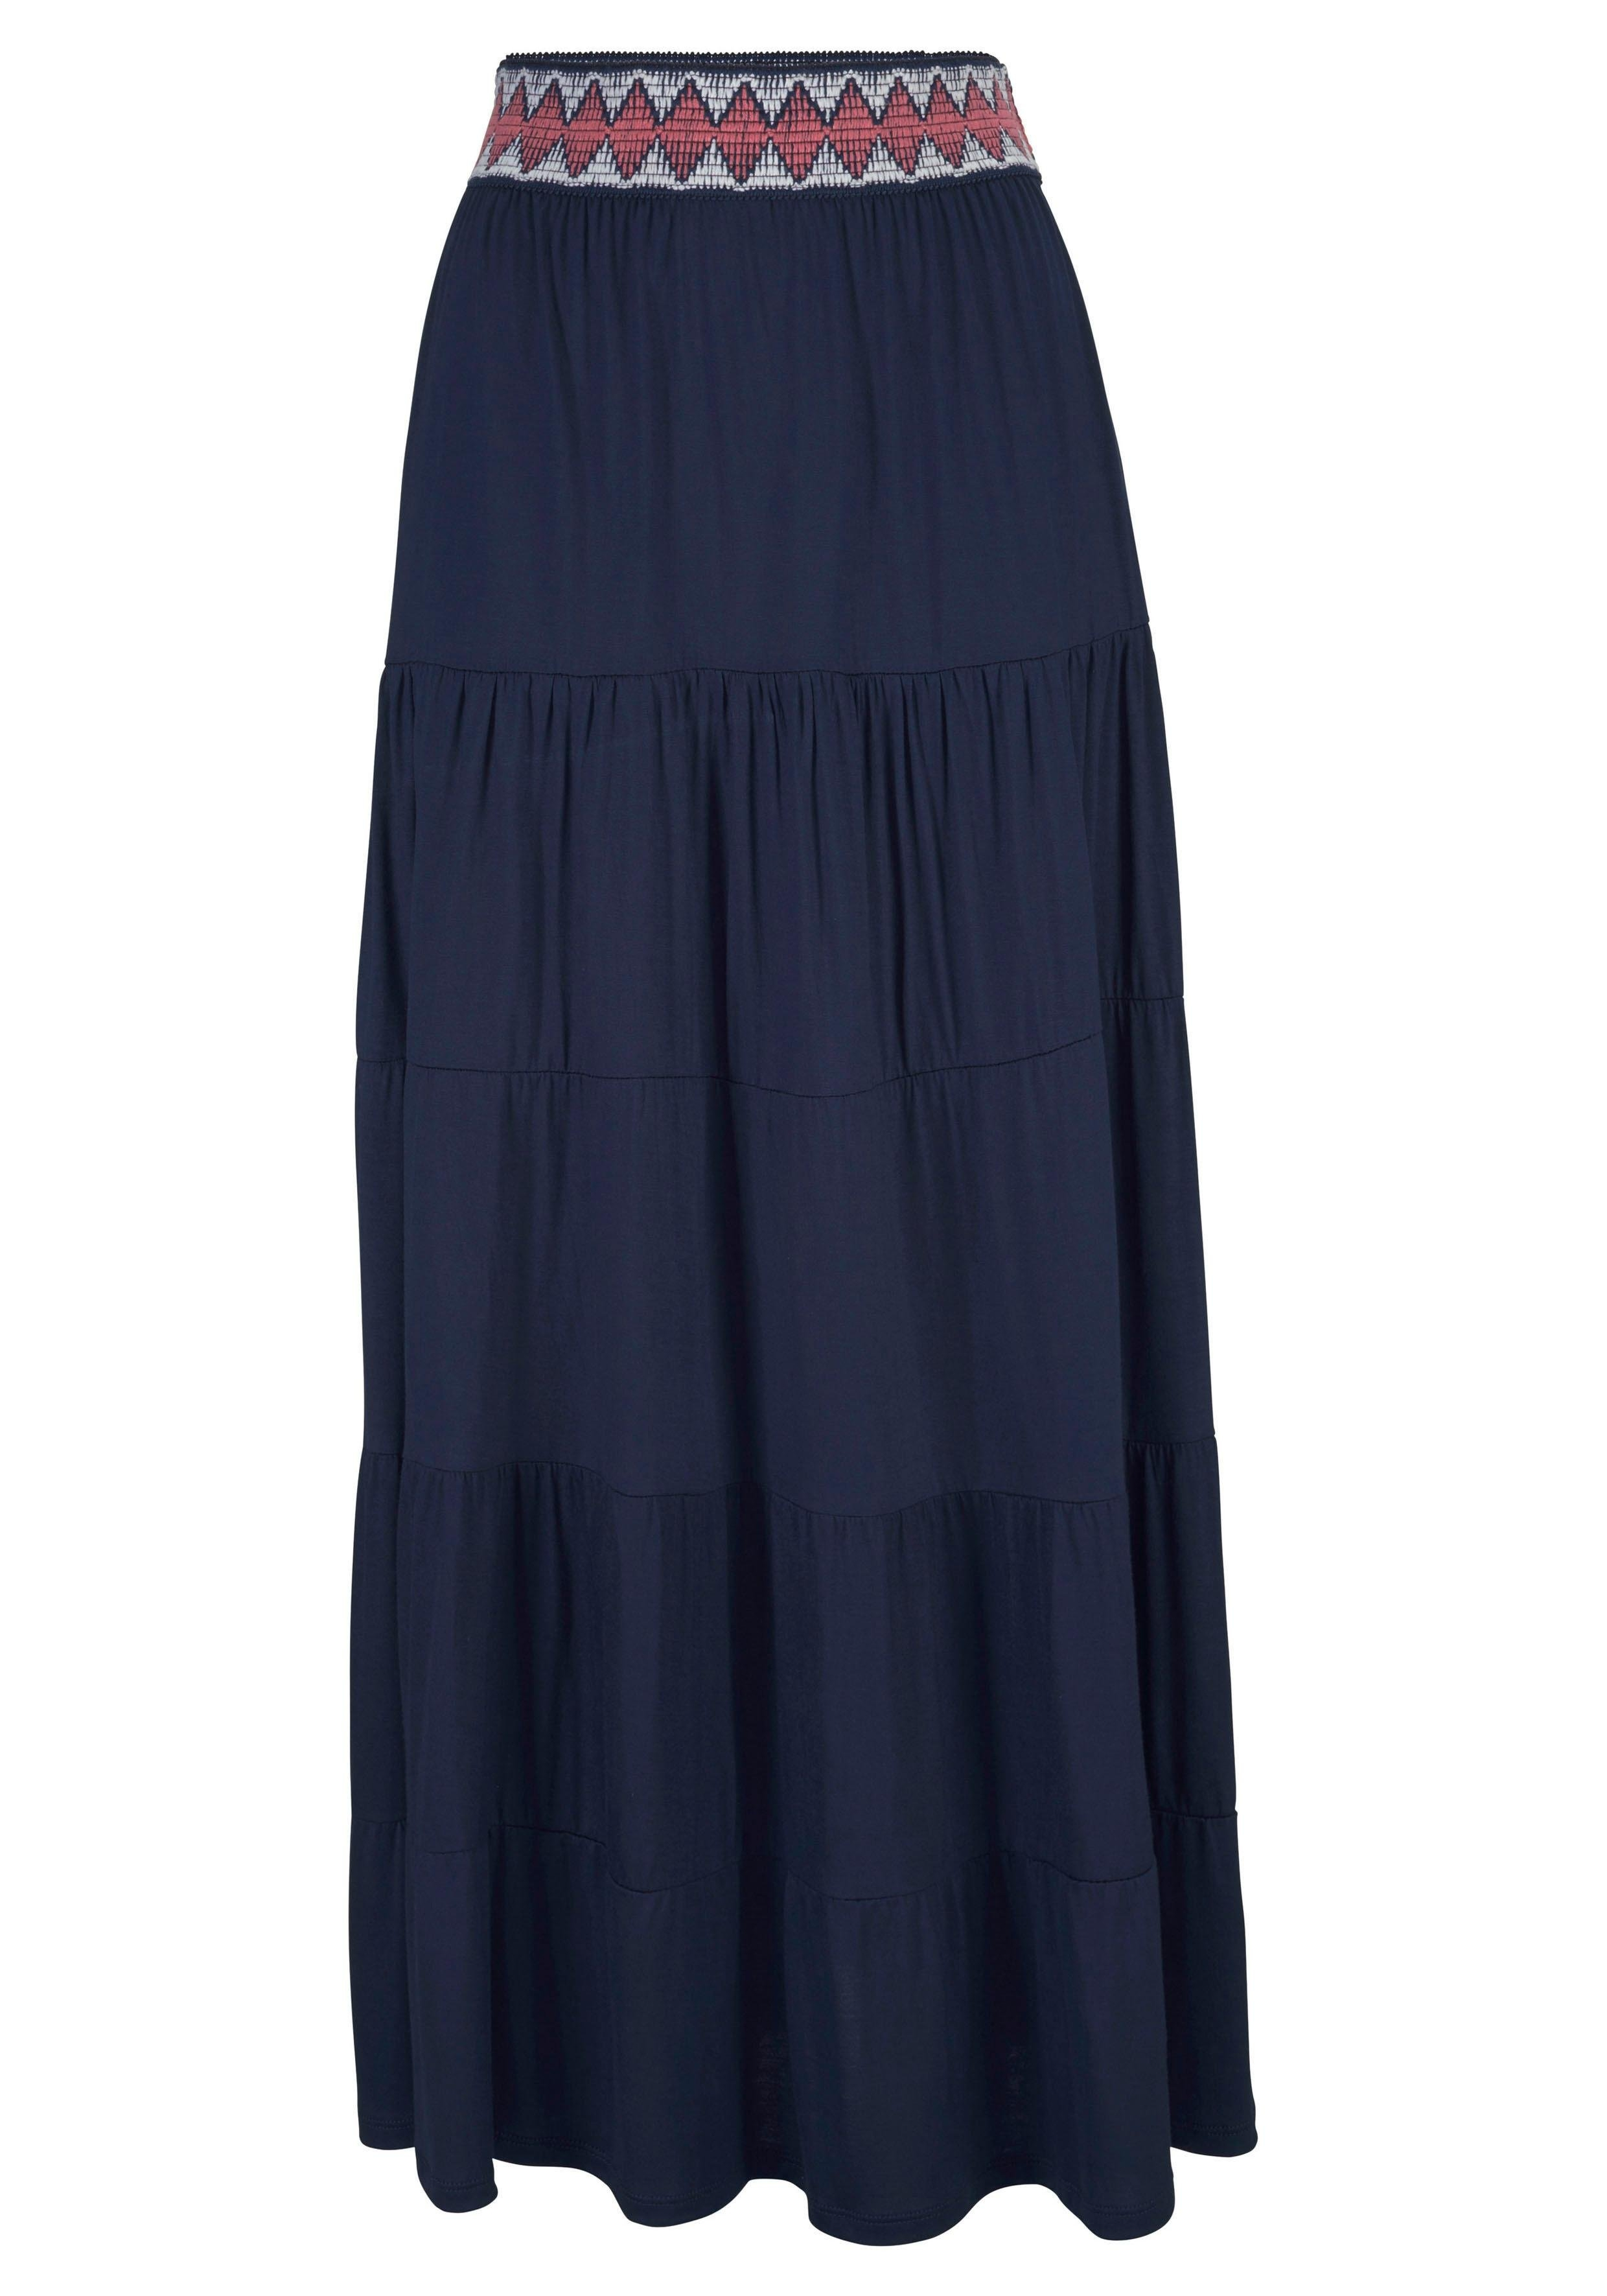 s.Oliver Beachwear s.Oliver RED LABEL Beachwear lange strandrok bij Lascana online kopen